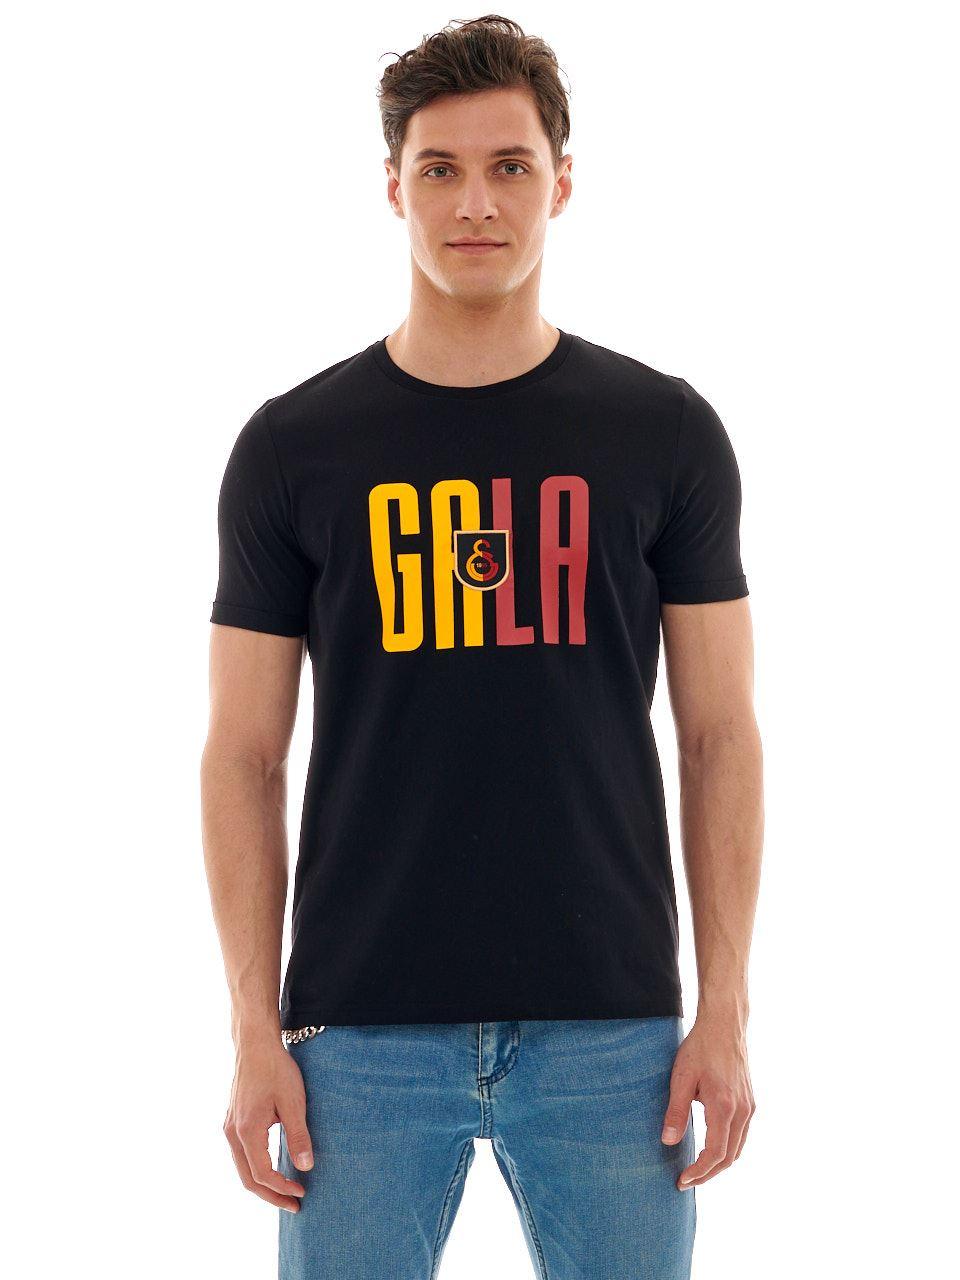 Galatasaray Gala Erkek T-shirt E211036